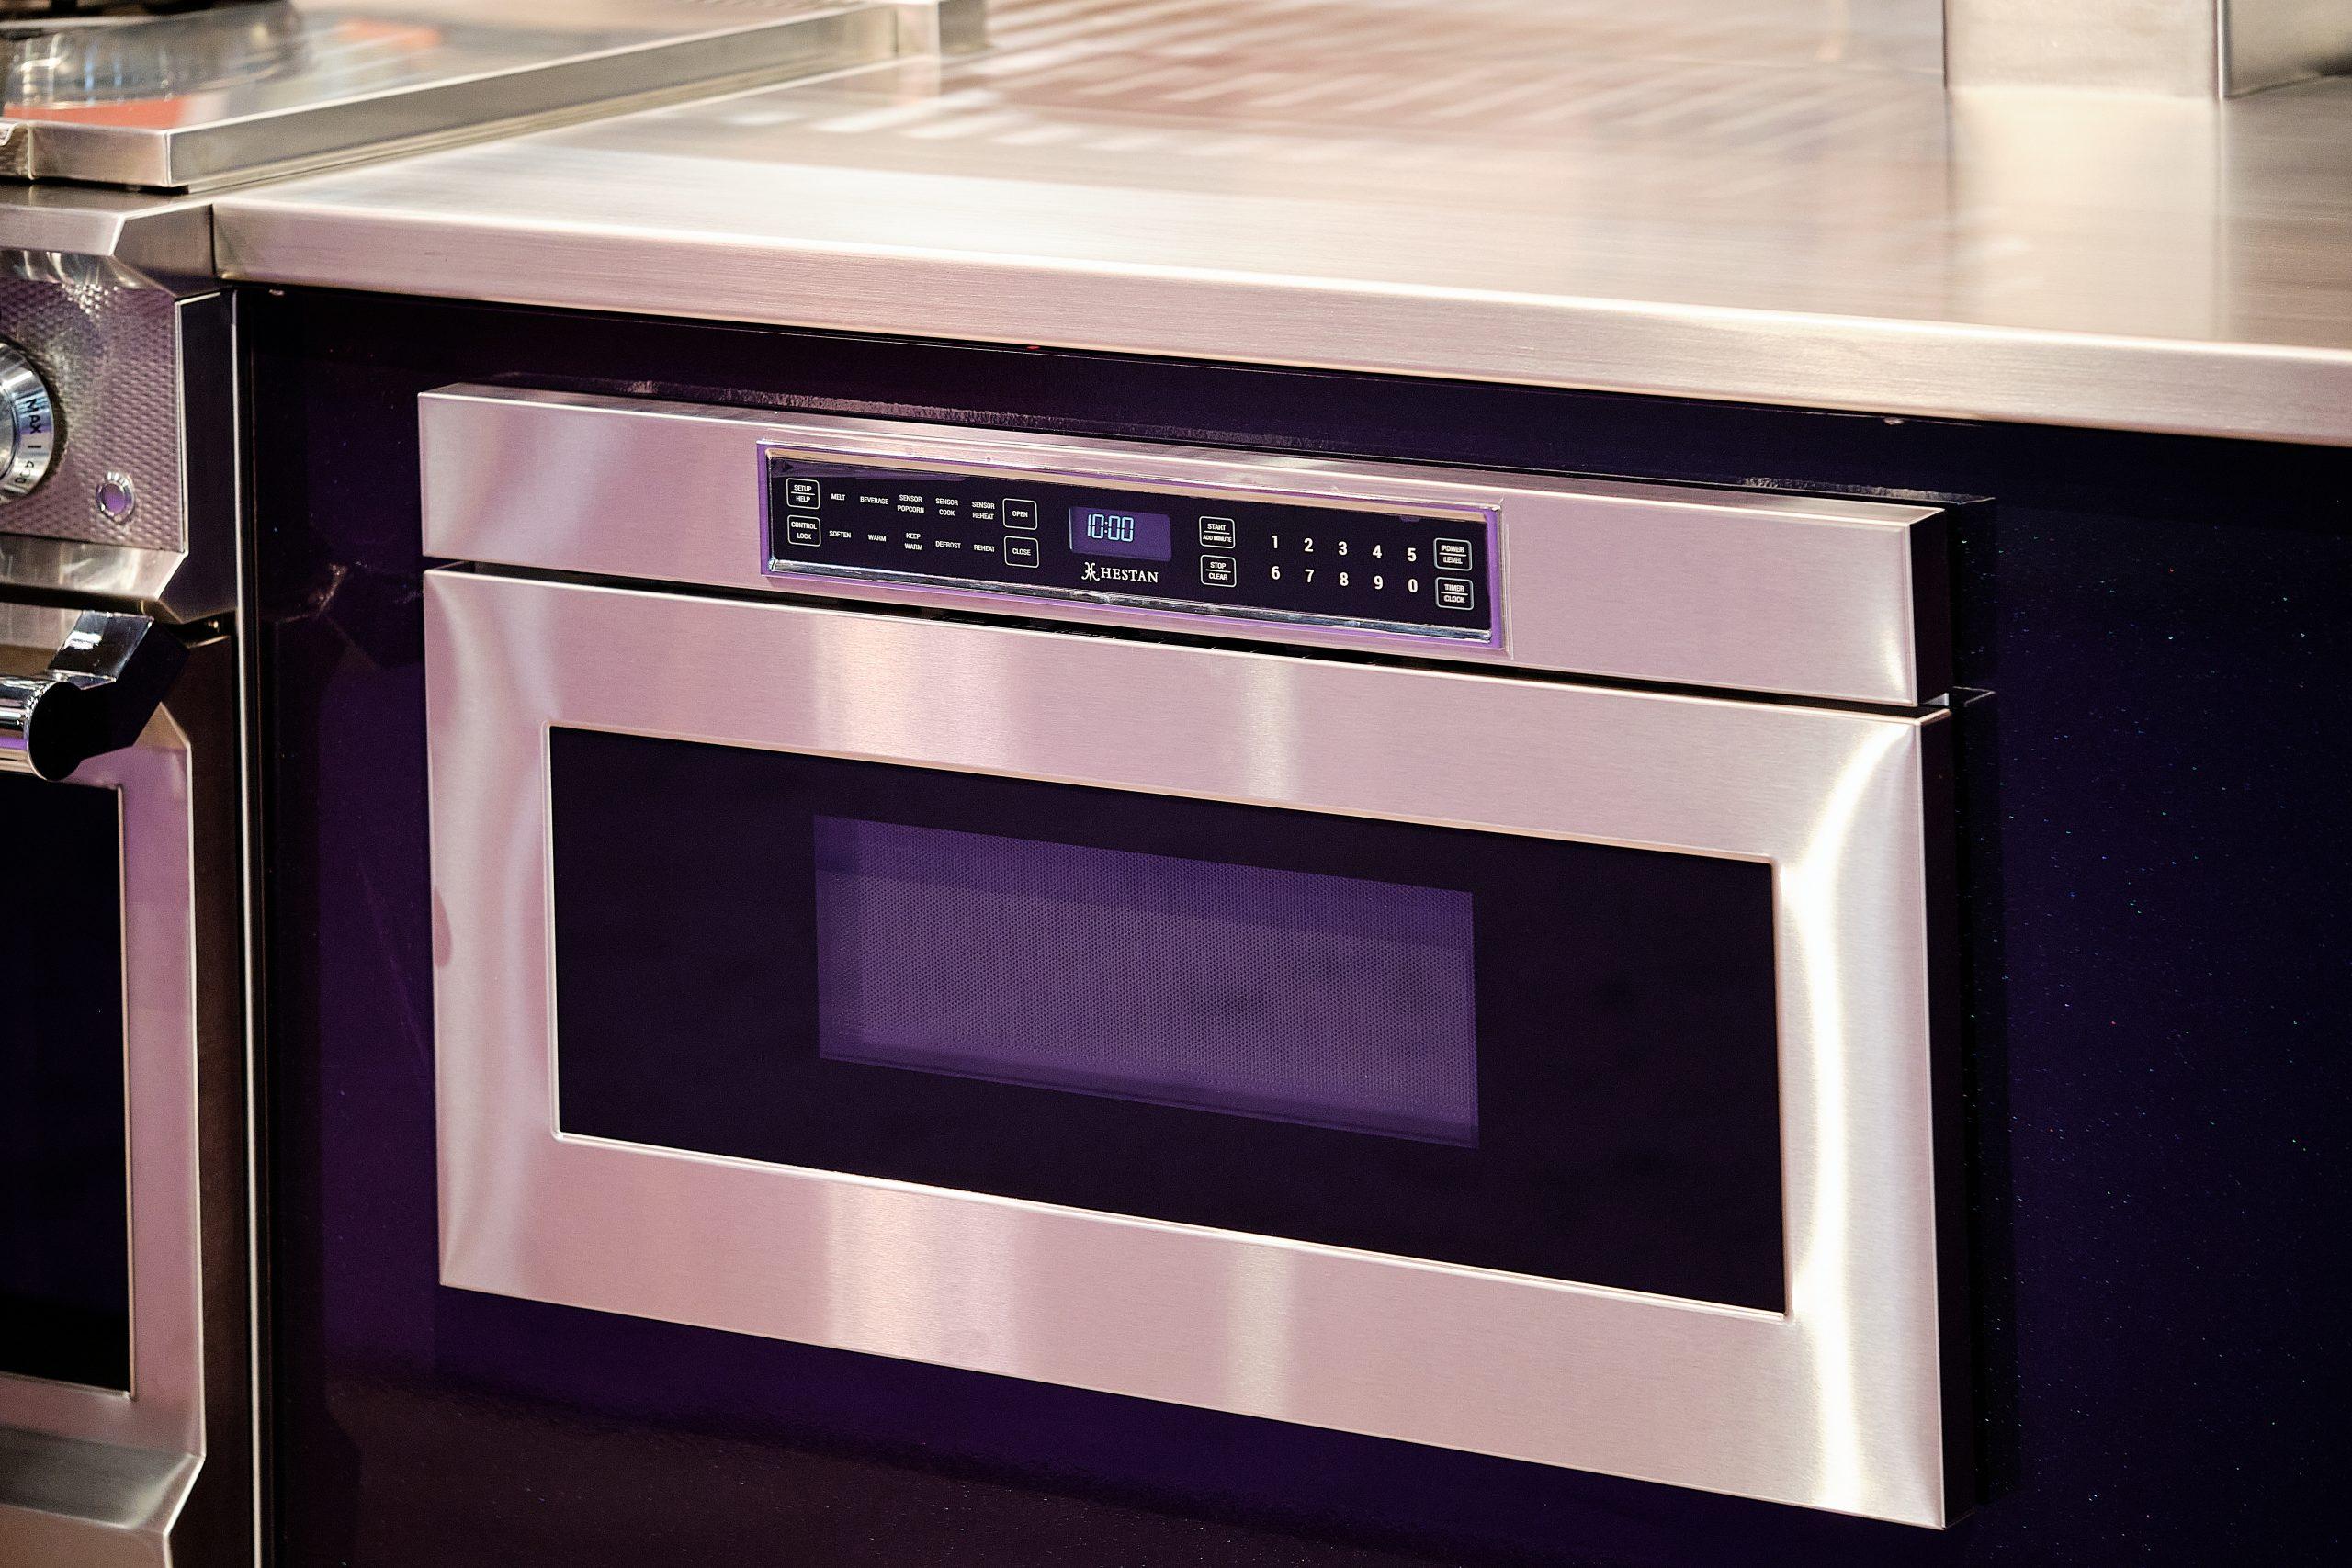 30 drawer microwave kmwr series